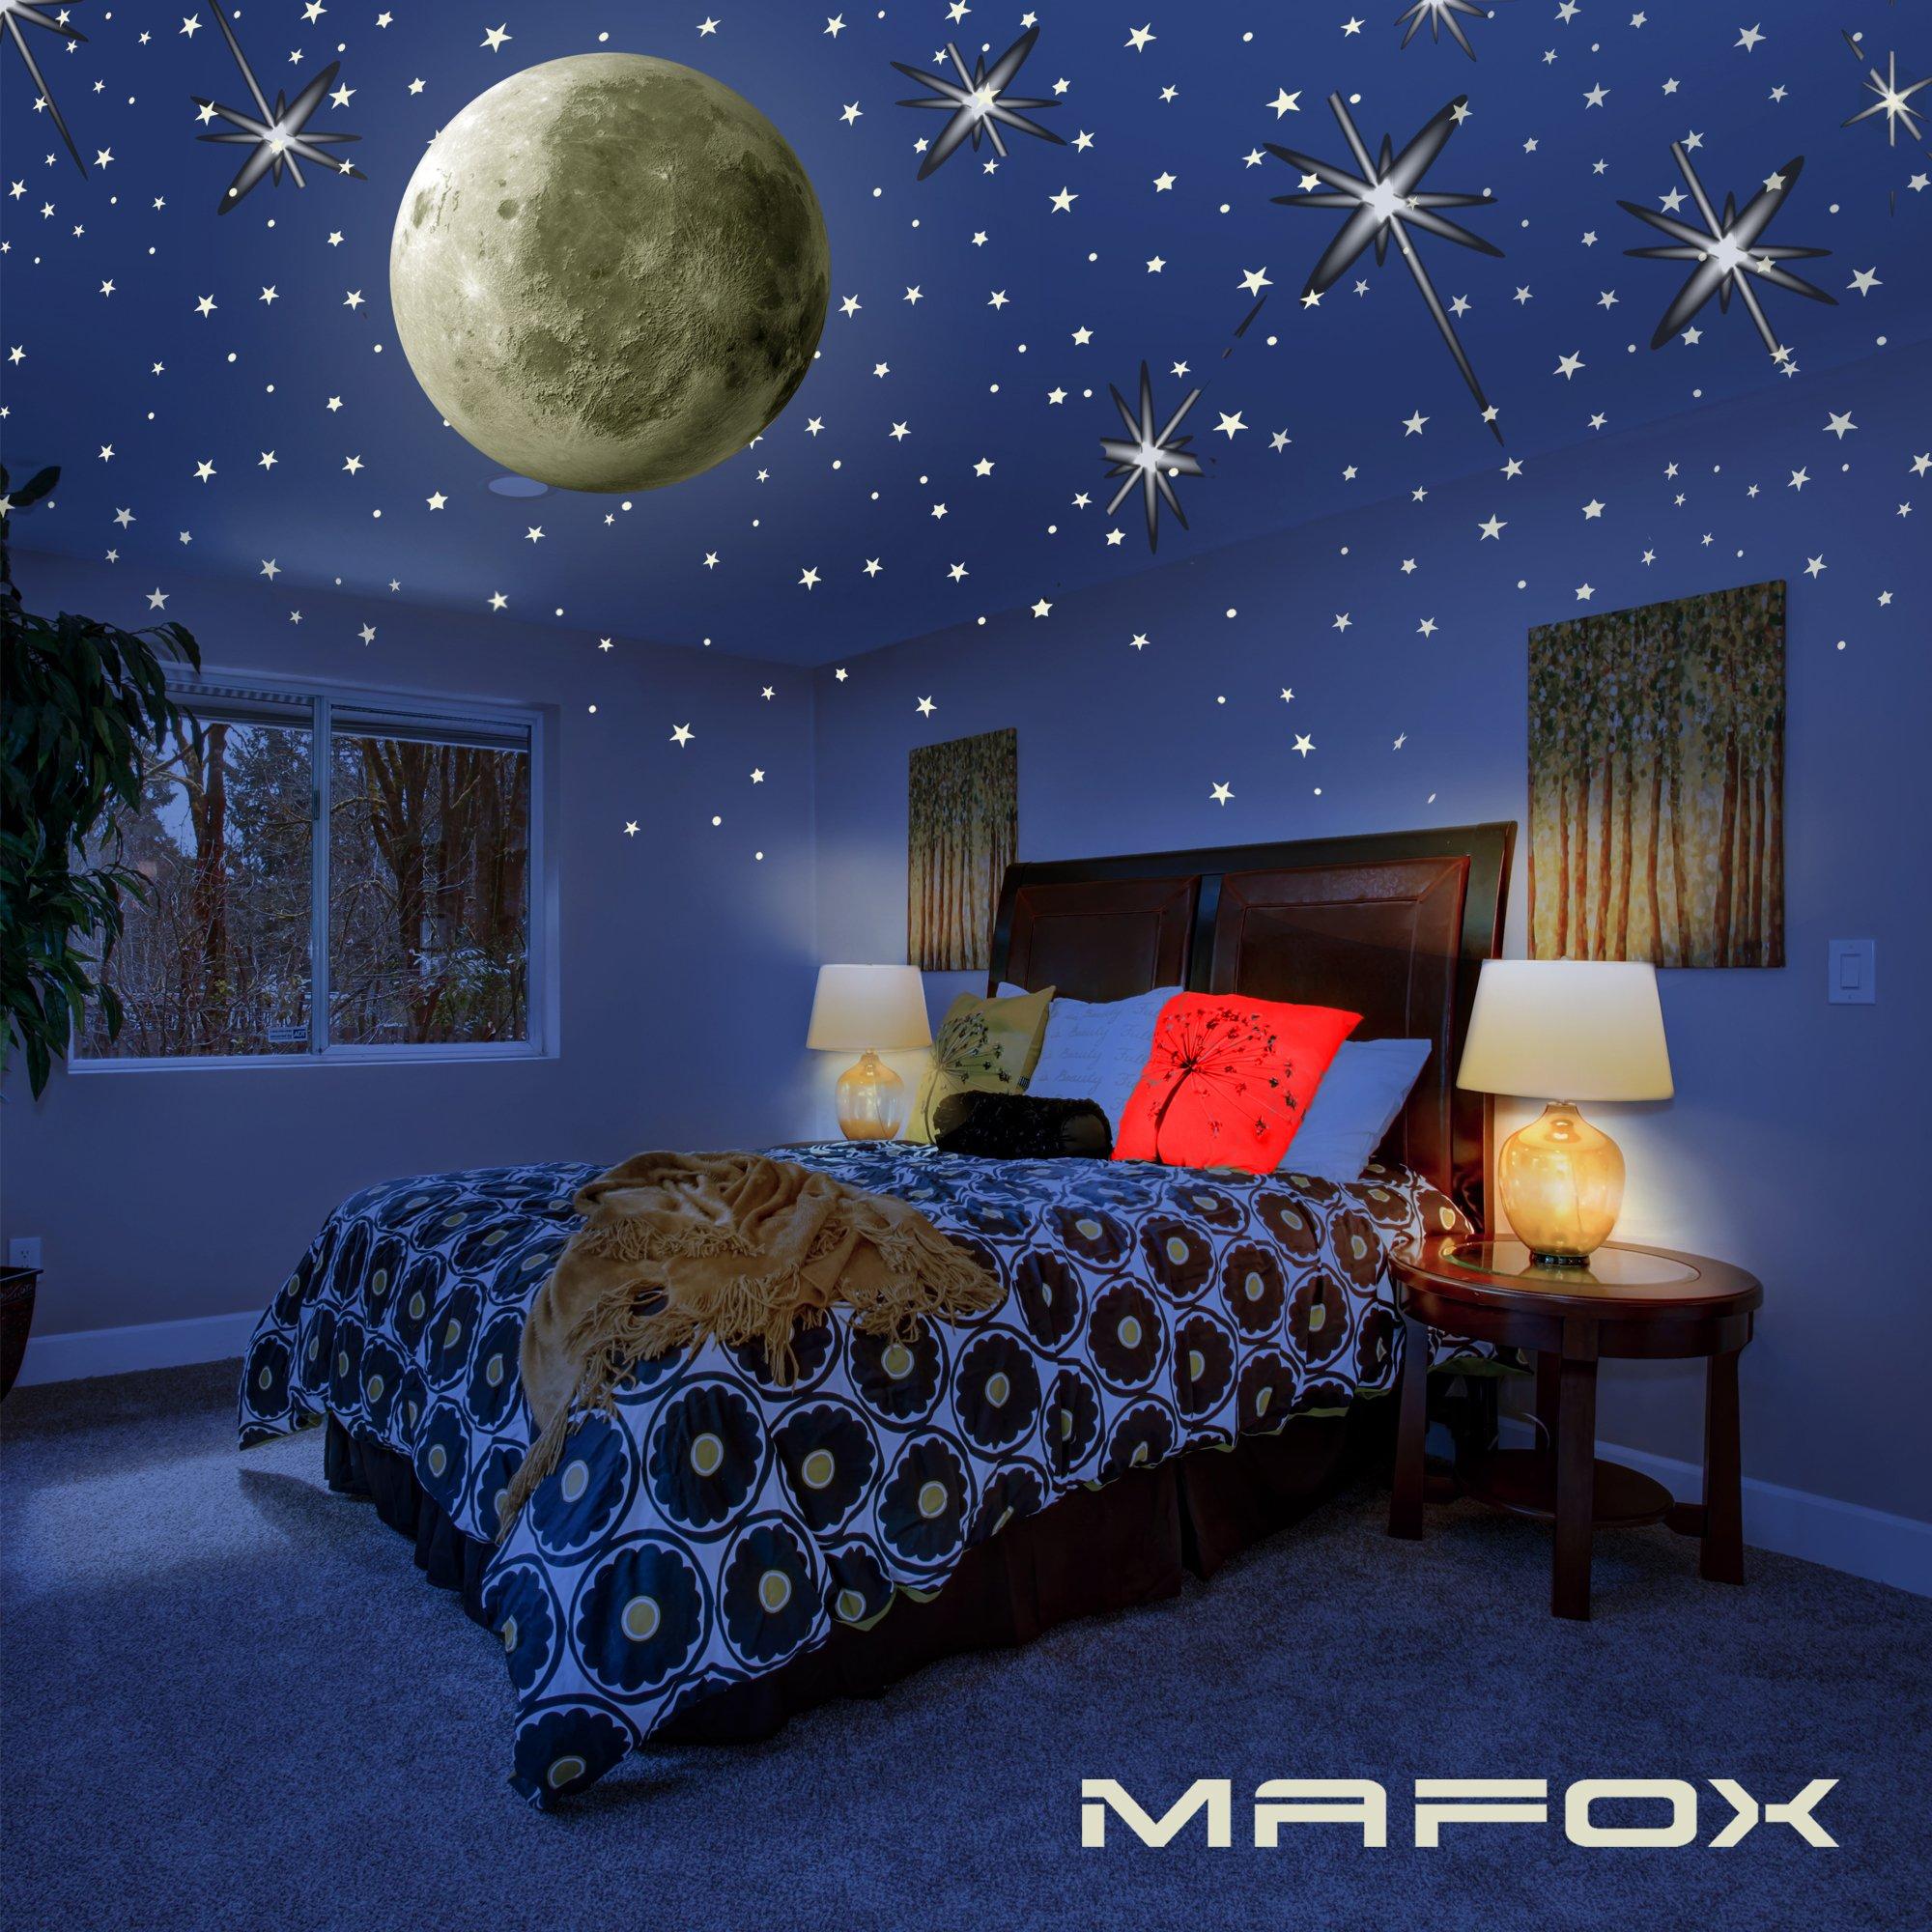 Amazon Glow In The Dark Stars Moon Earth Wall Stickers